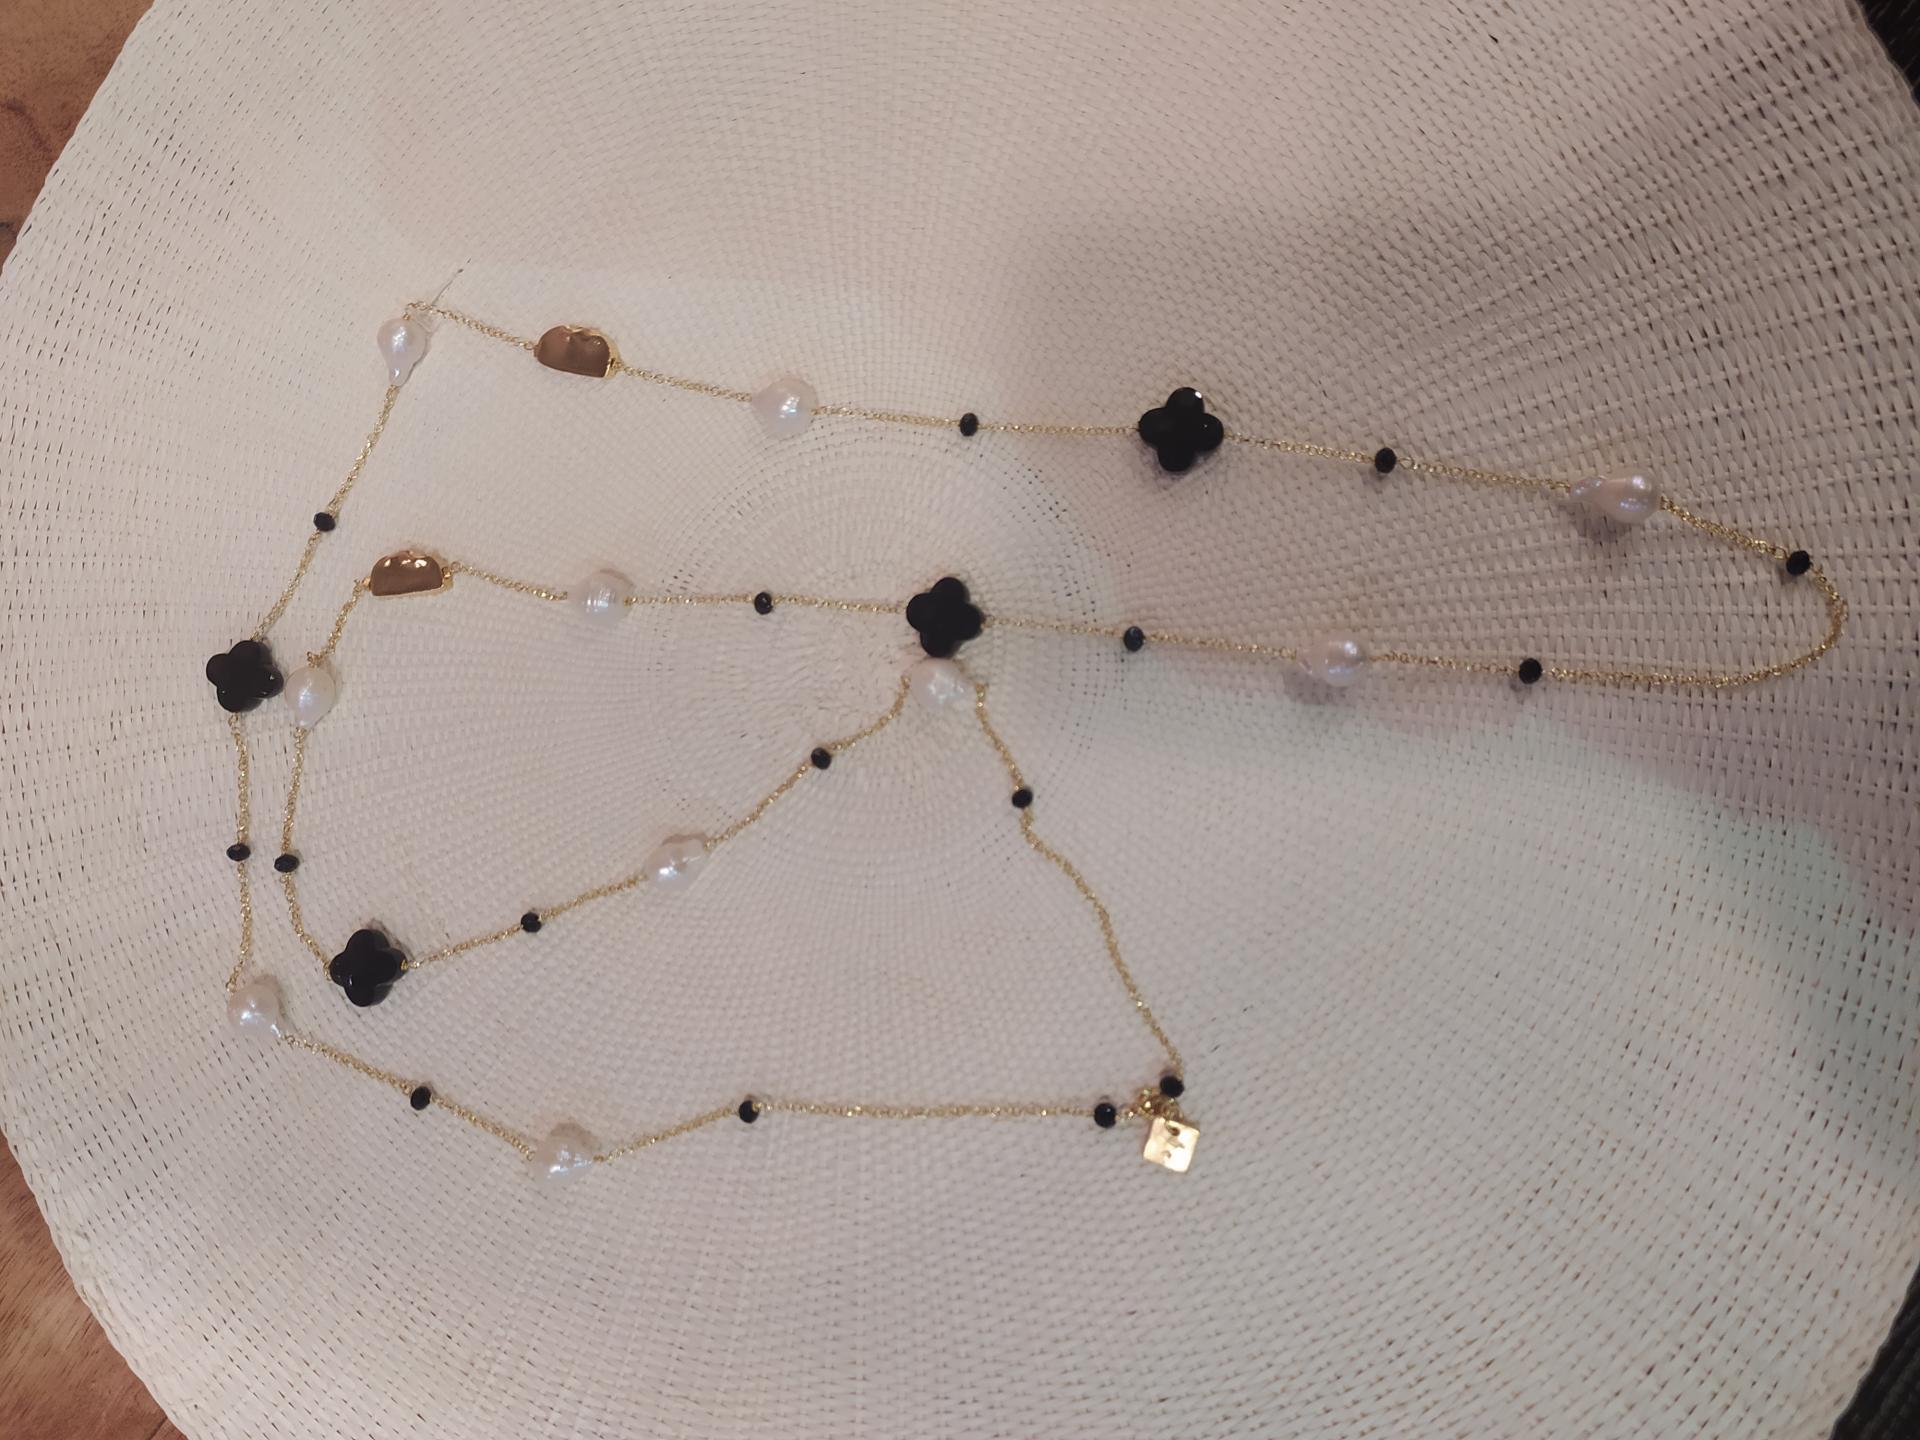 Sautoir onyx et perles baroques ref 365 7 34 gr